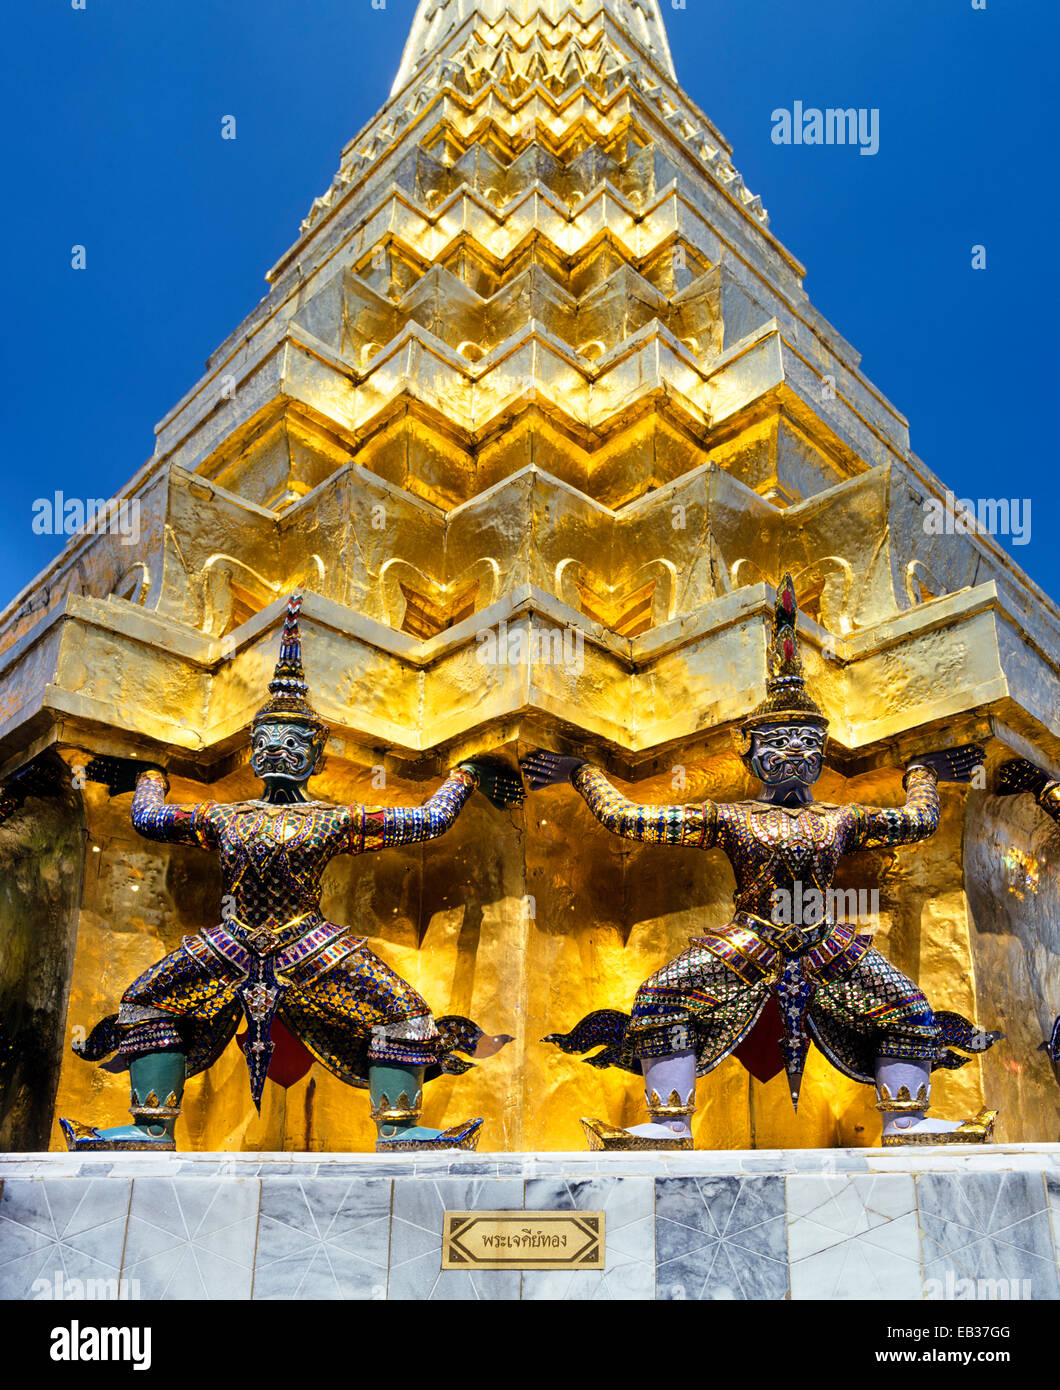 Wat Phra Kaeo Temple, Royal Palace, Caryatid demons on a golden chedi, Bangkok, Central Thailand, Thailand - Stock Image